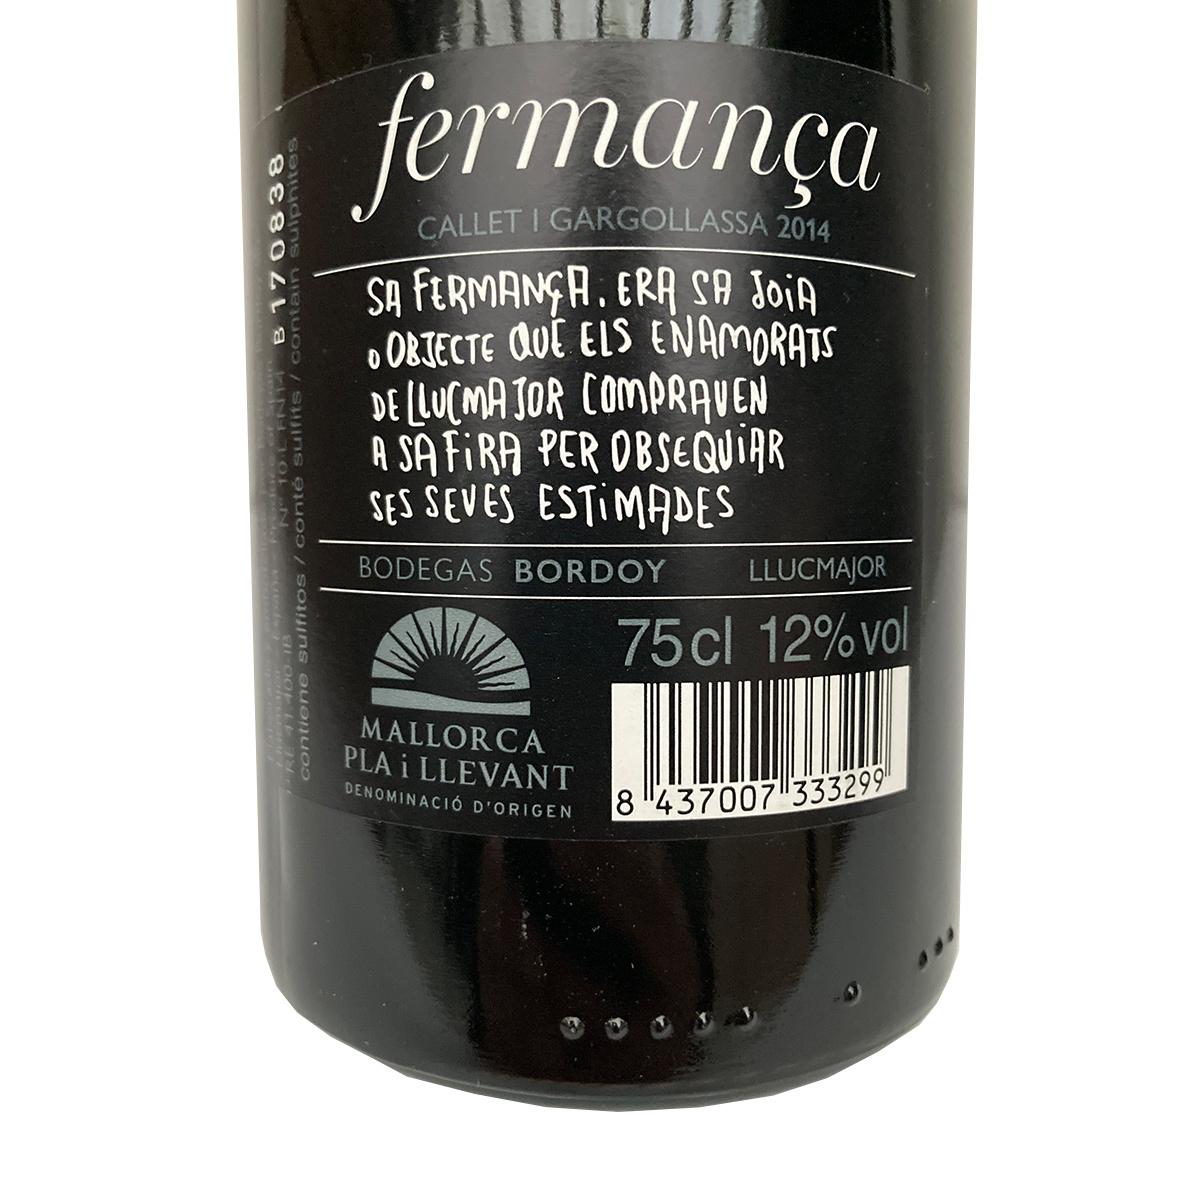 Fermanca - Negre 2014